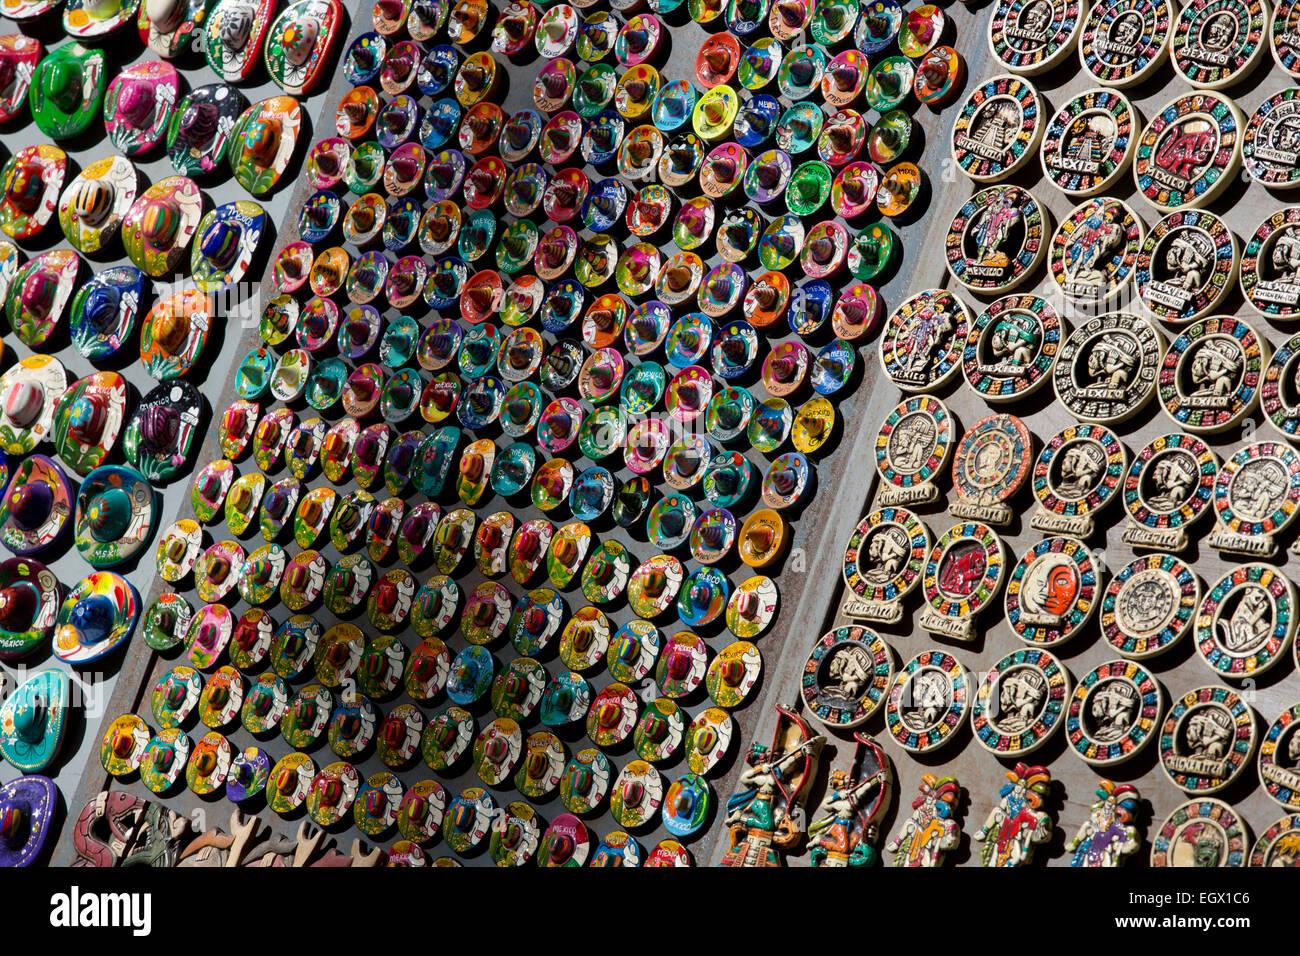 souvenir miniature sombreros Chichen Itza, Yucatan, Mexico - Stock Image